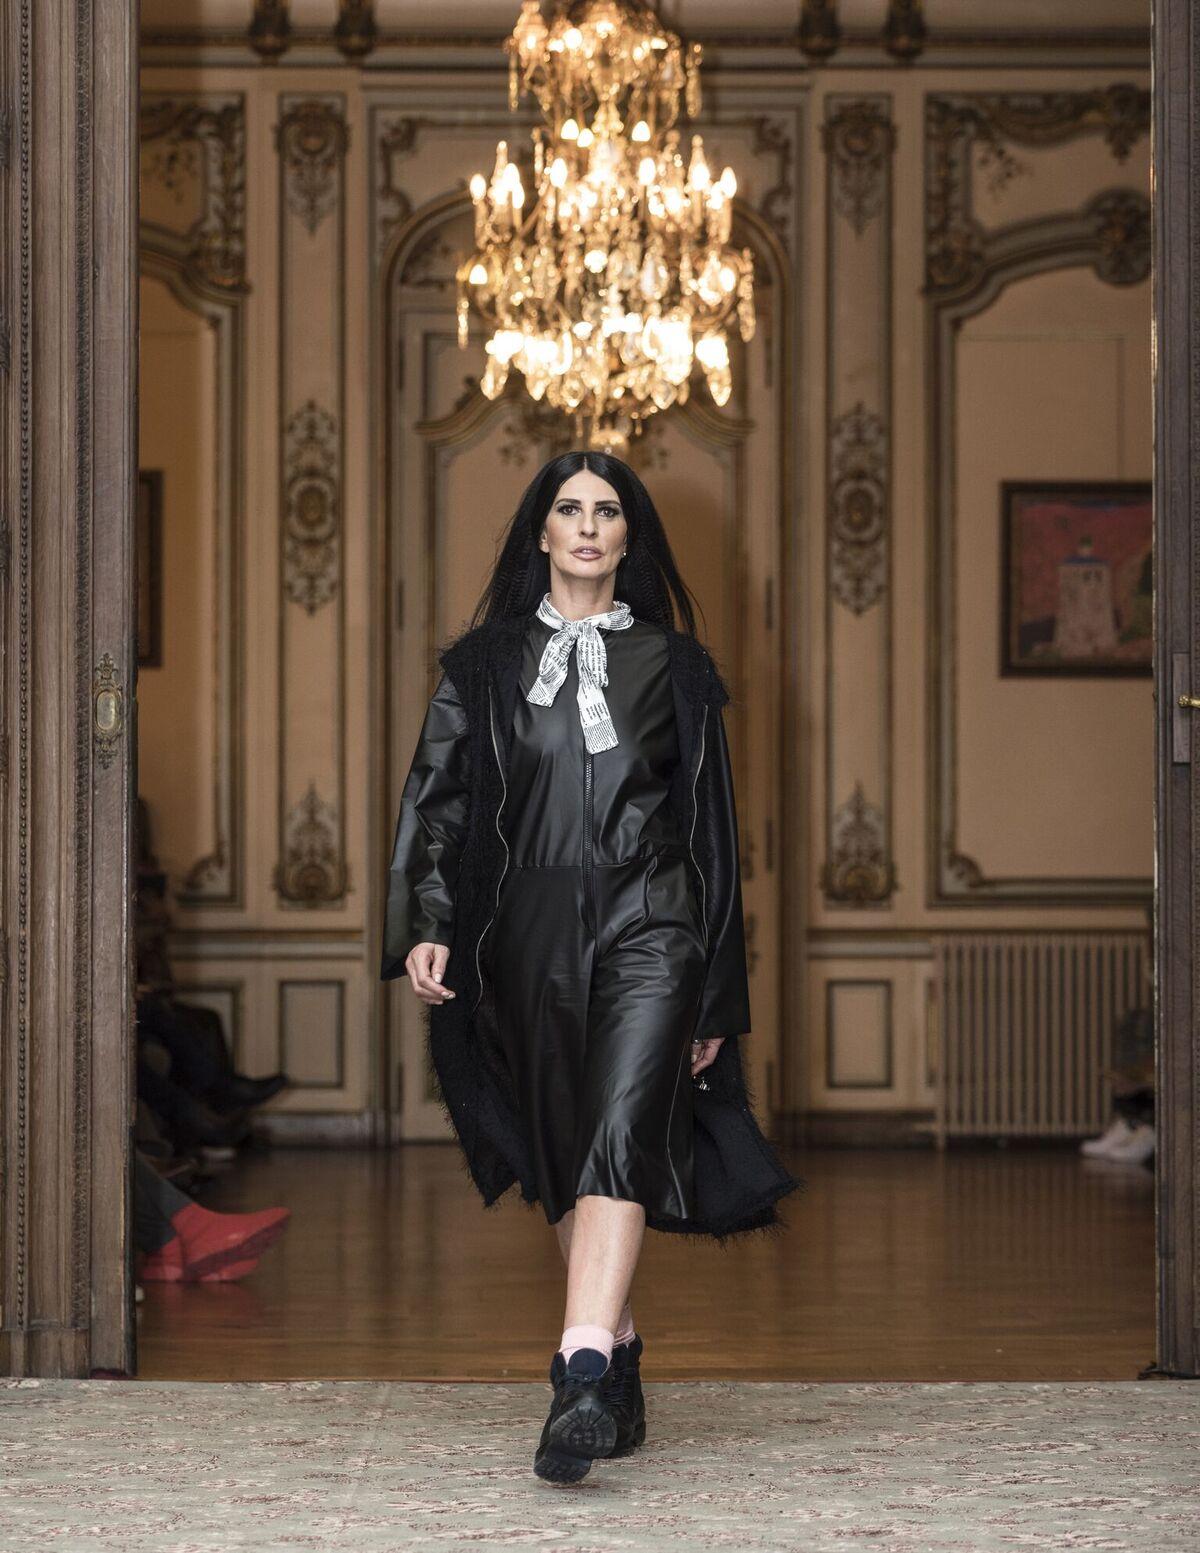 Shaleva freedom ss20 during paris fashion week (6)